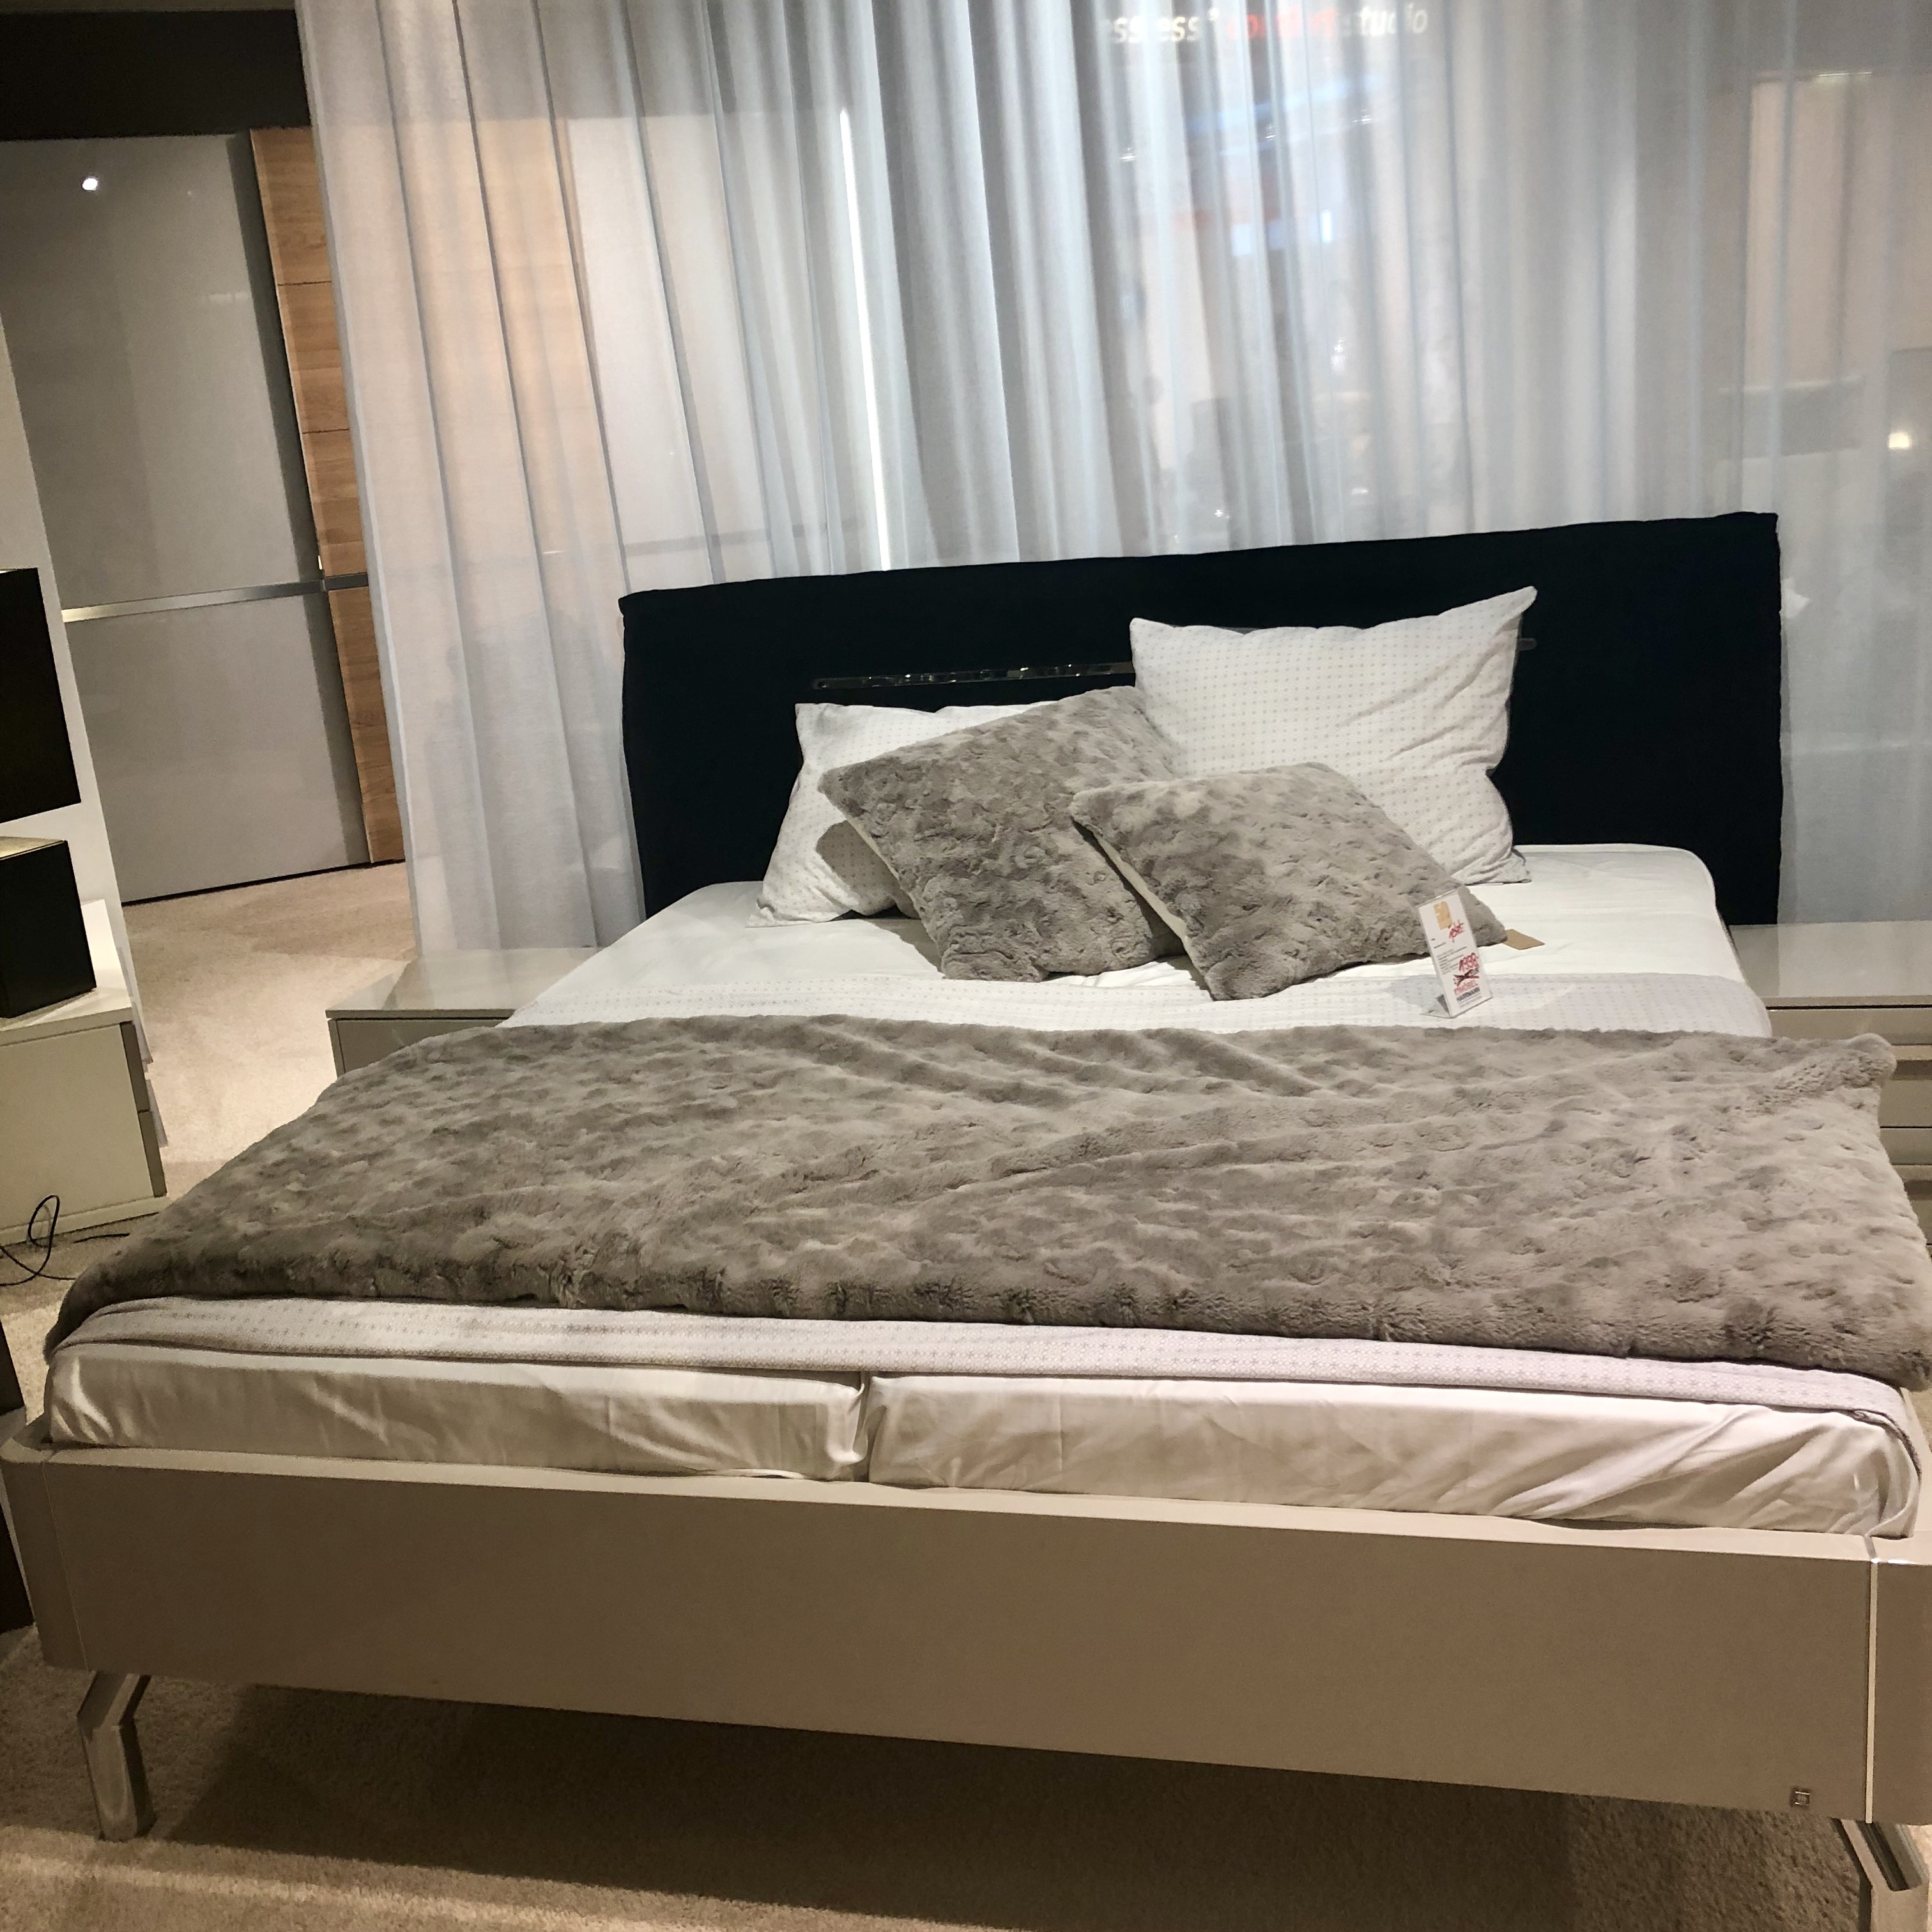 mein ausstellungsst ck betten. Black Bedroom Furniture Sets. Home Design Ideas